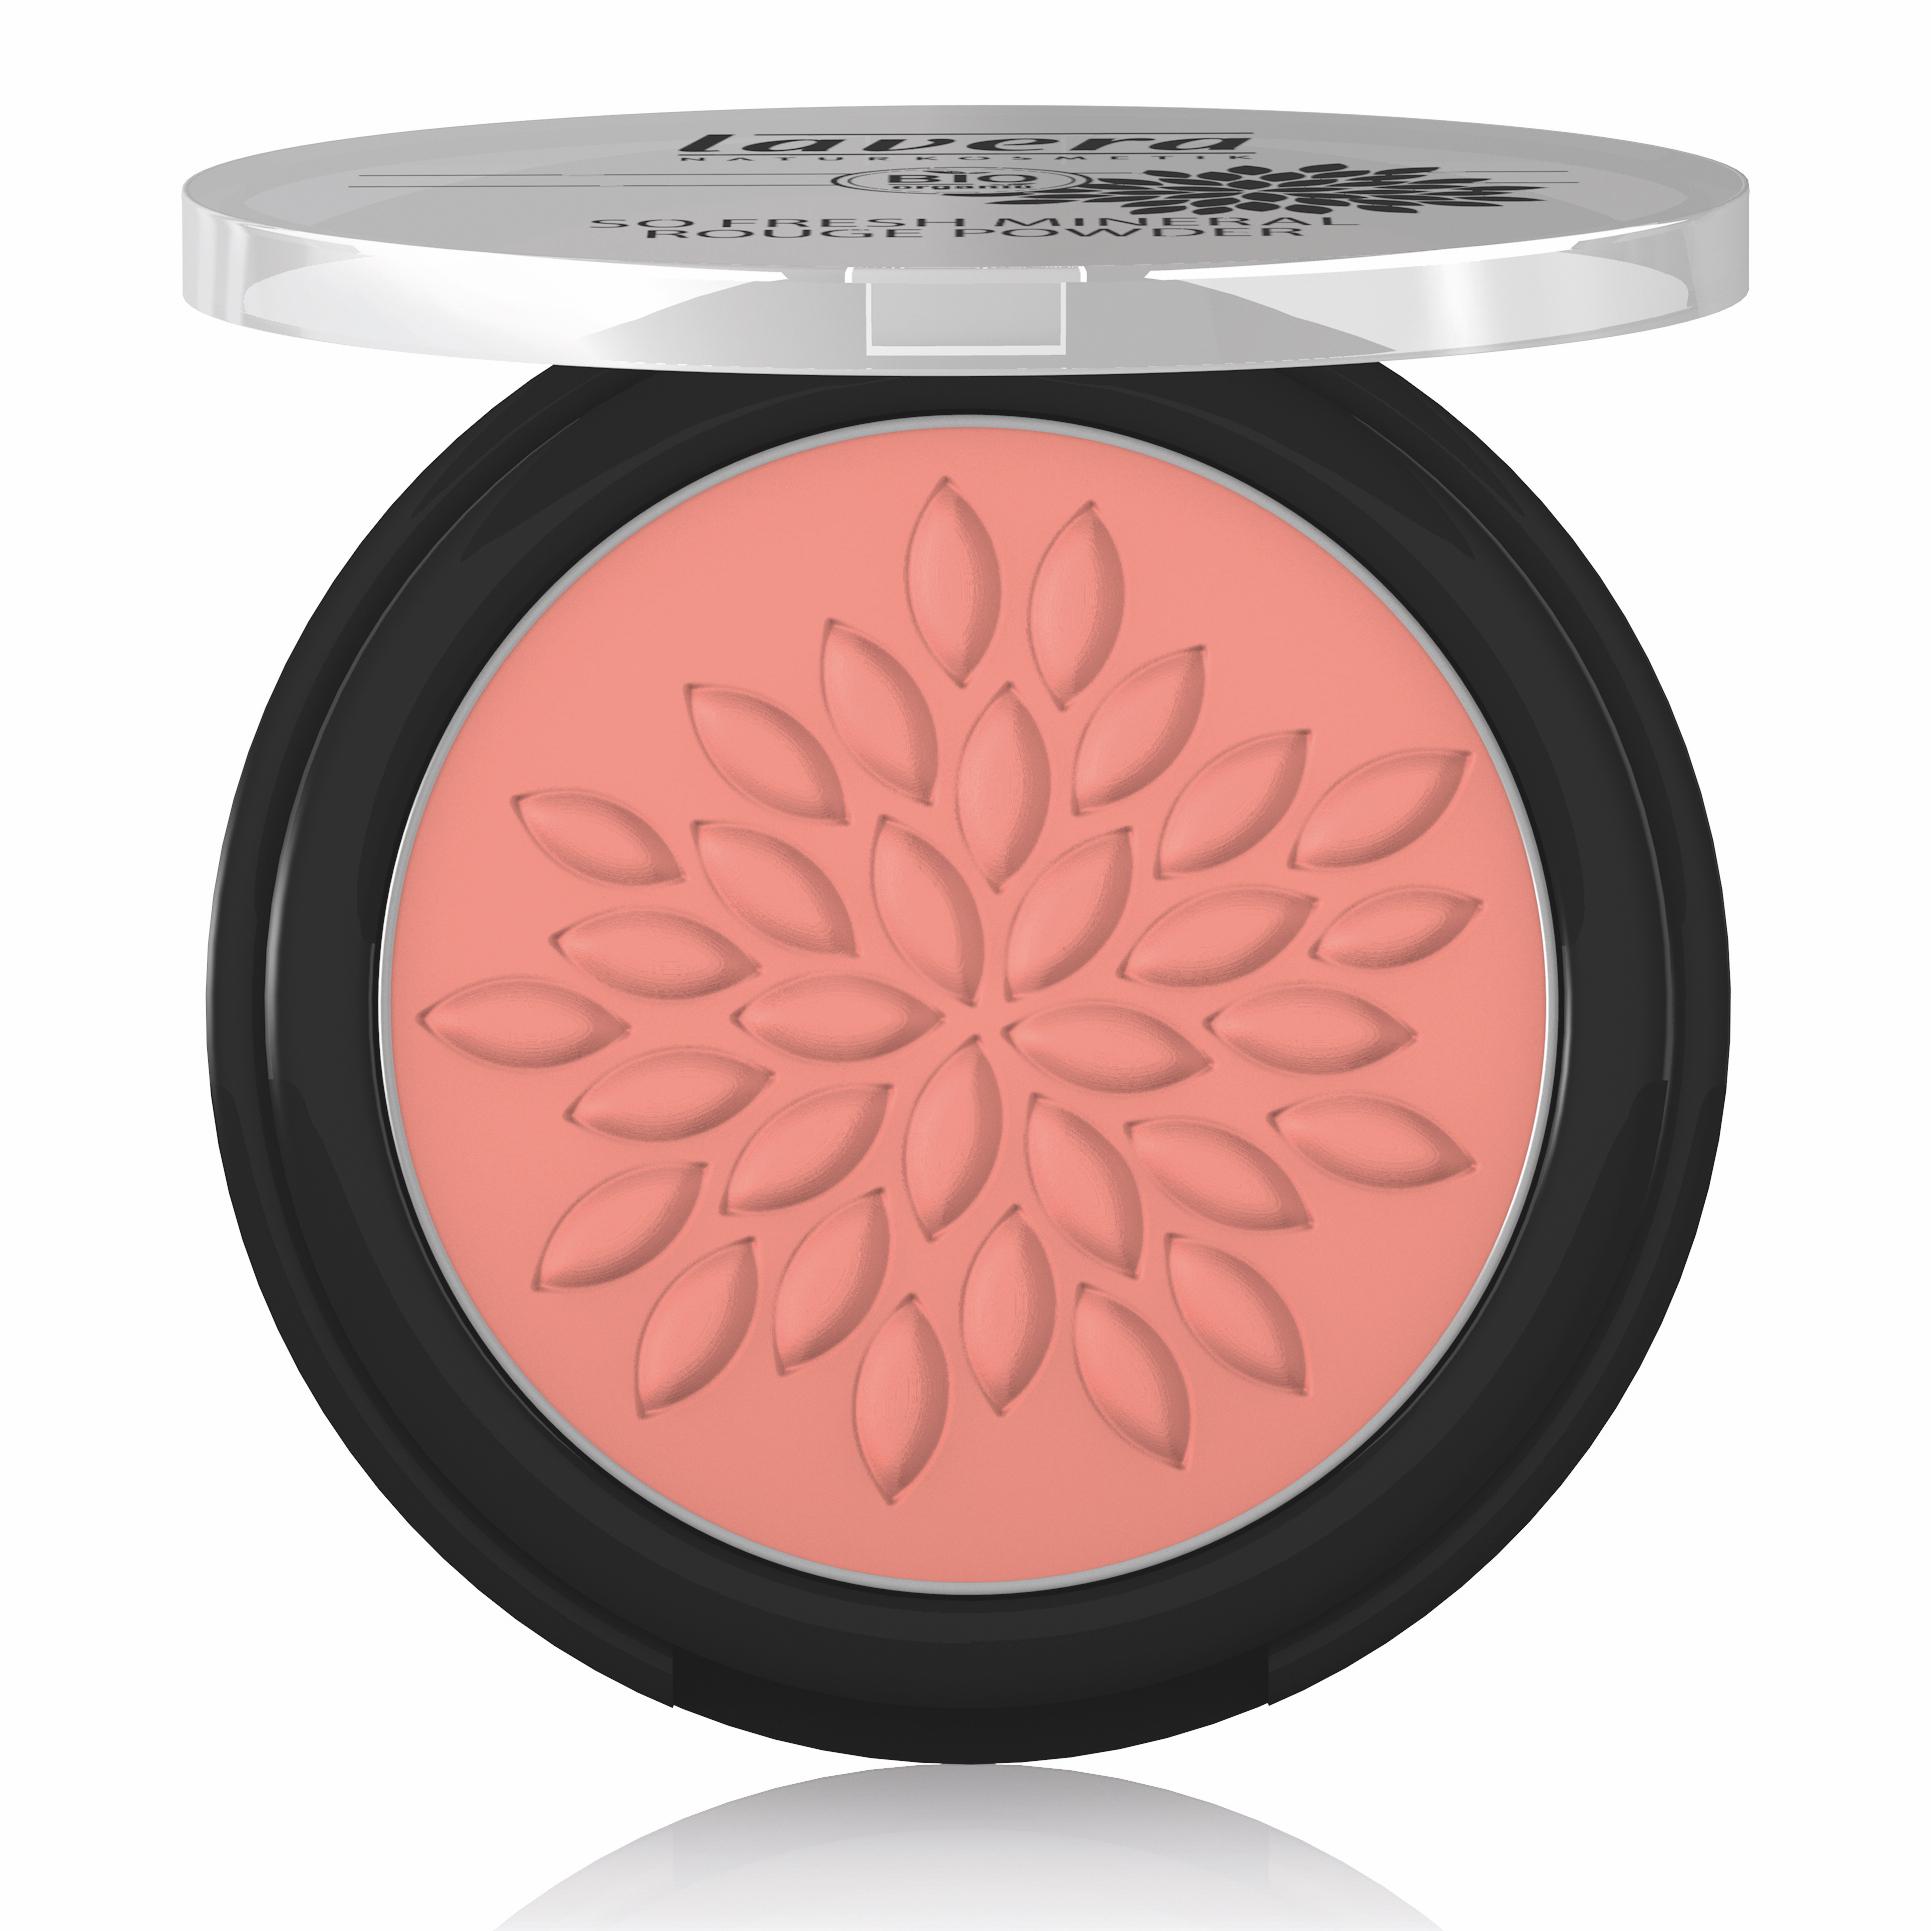 Lavera So Fresh Mineral Rouge Blush Powder Charming Rose